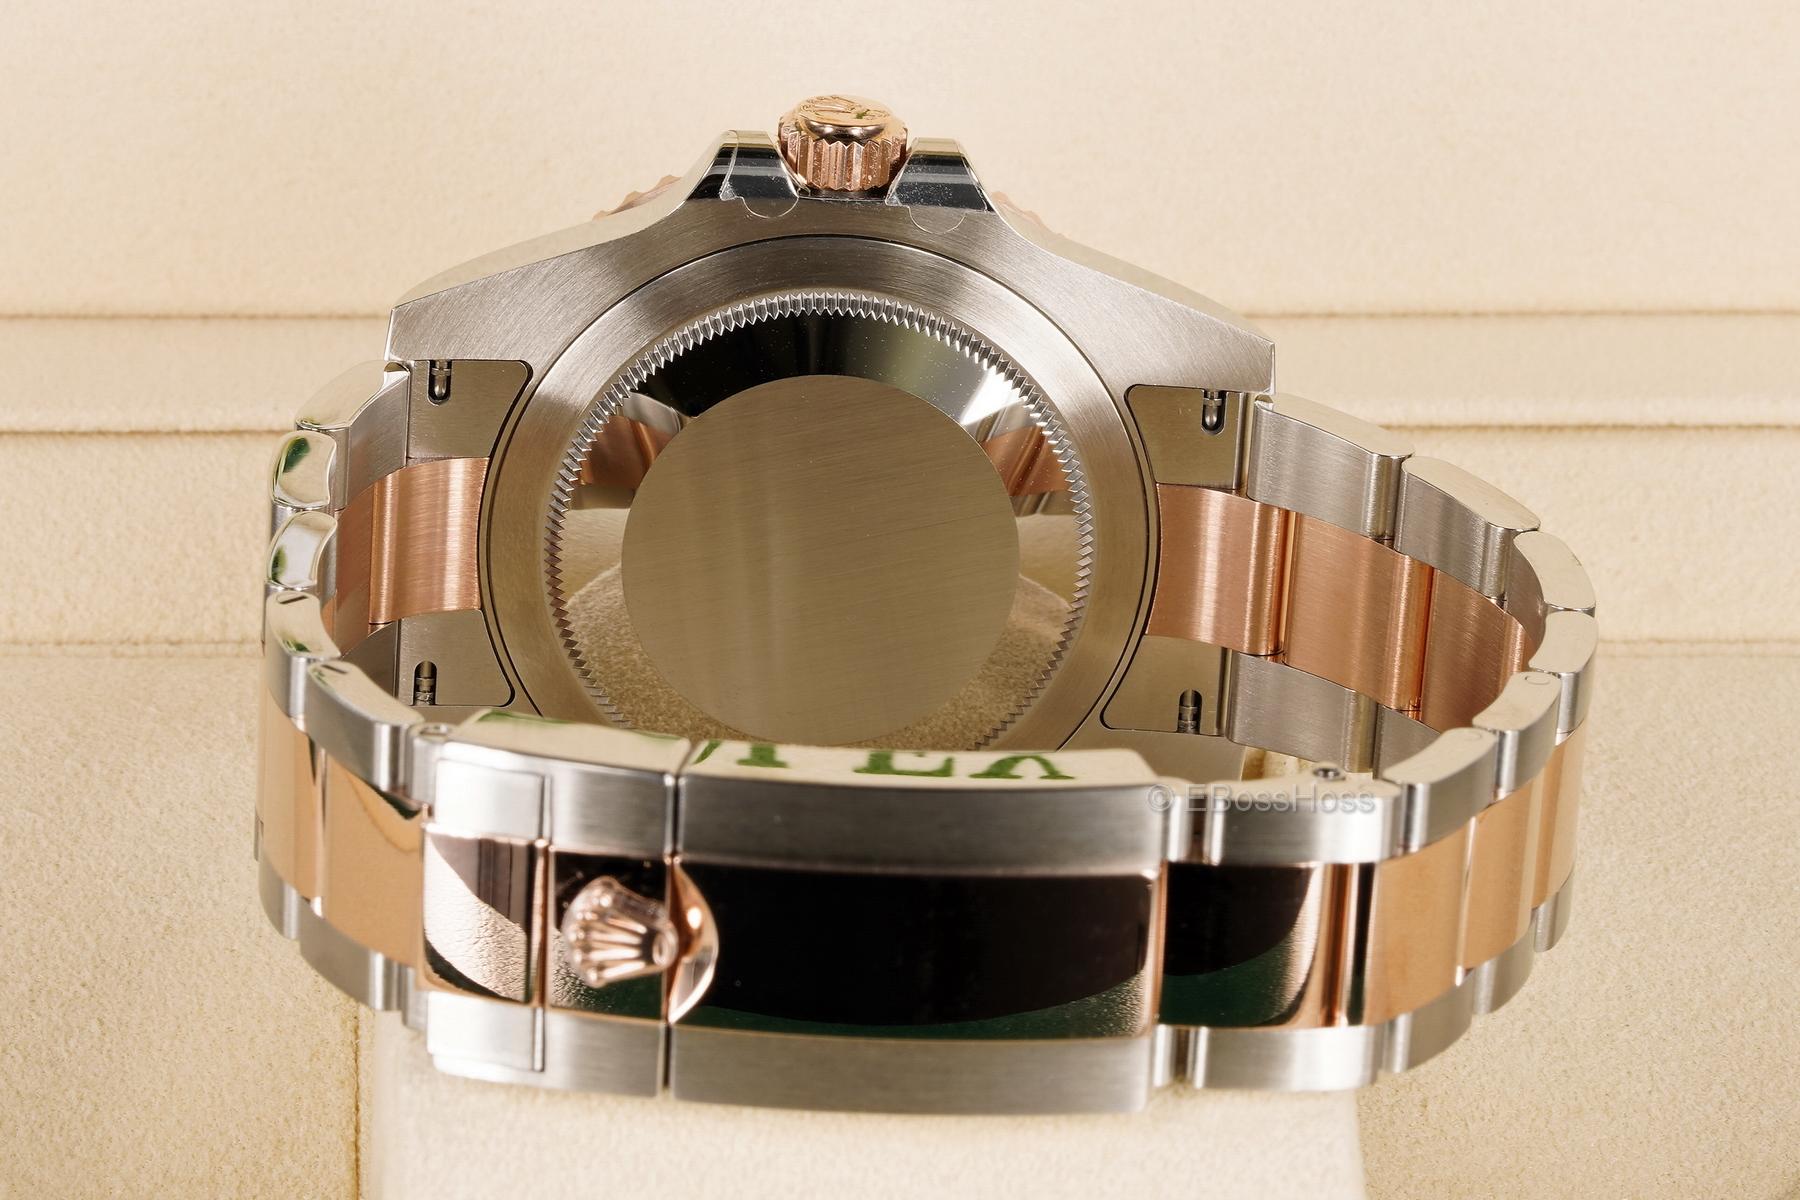 Rolex Oystersteel & Everose Gold GMT-Master II - 126711CHNR